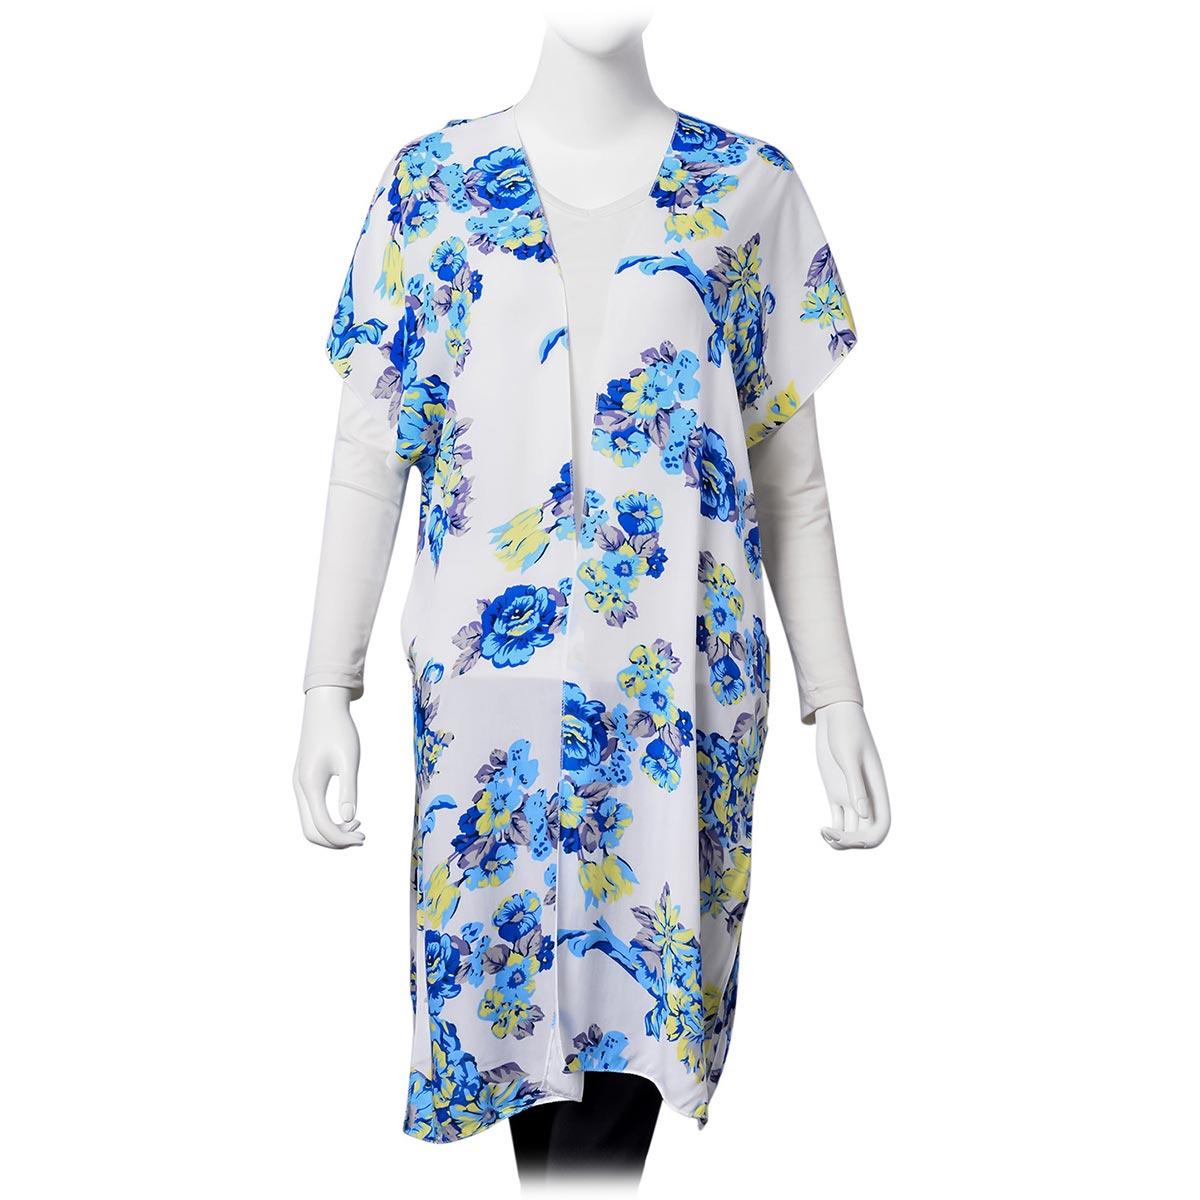 White 100% Viscose Multi Color Flower Print Open Sleeveless Cardigan (One Size)